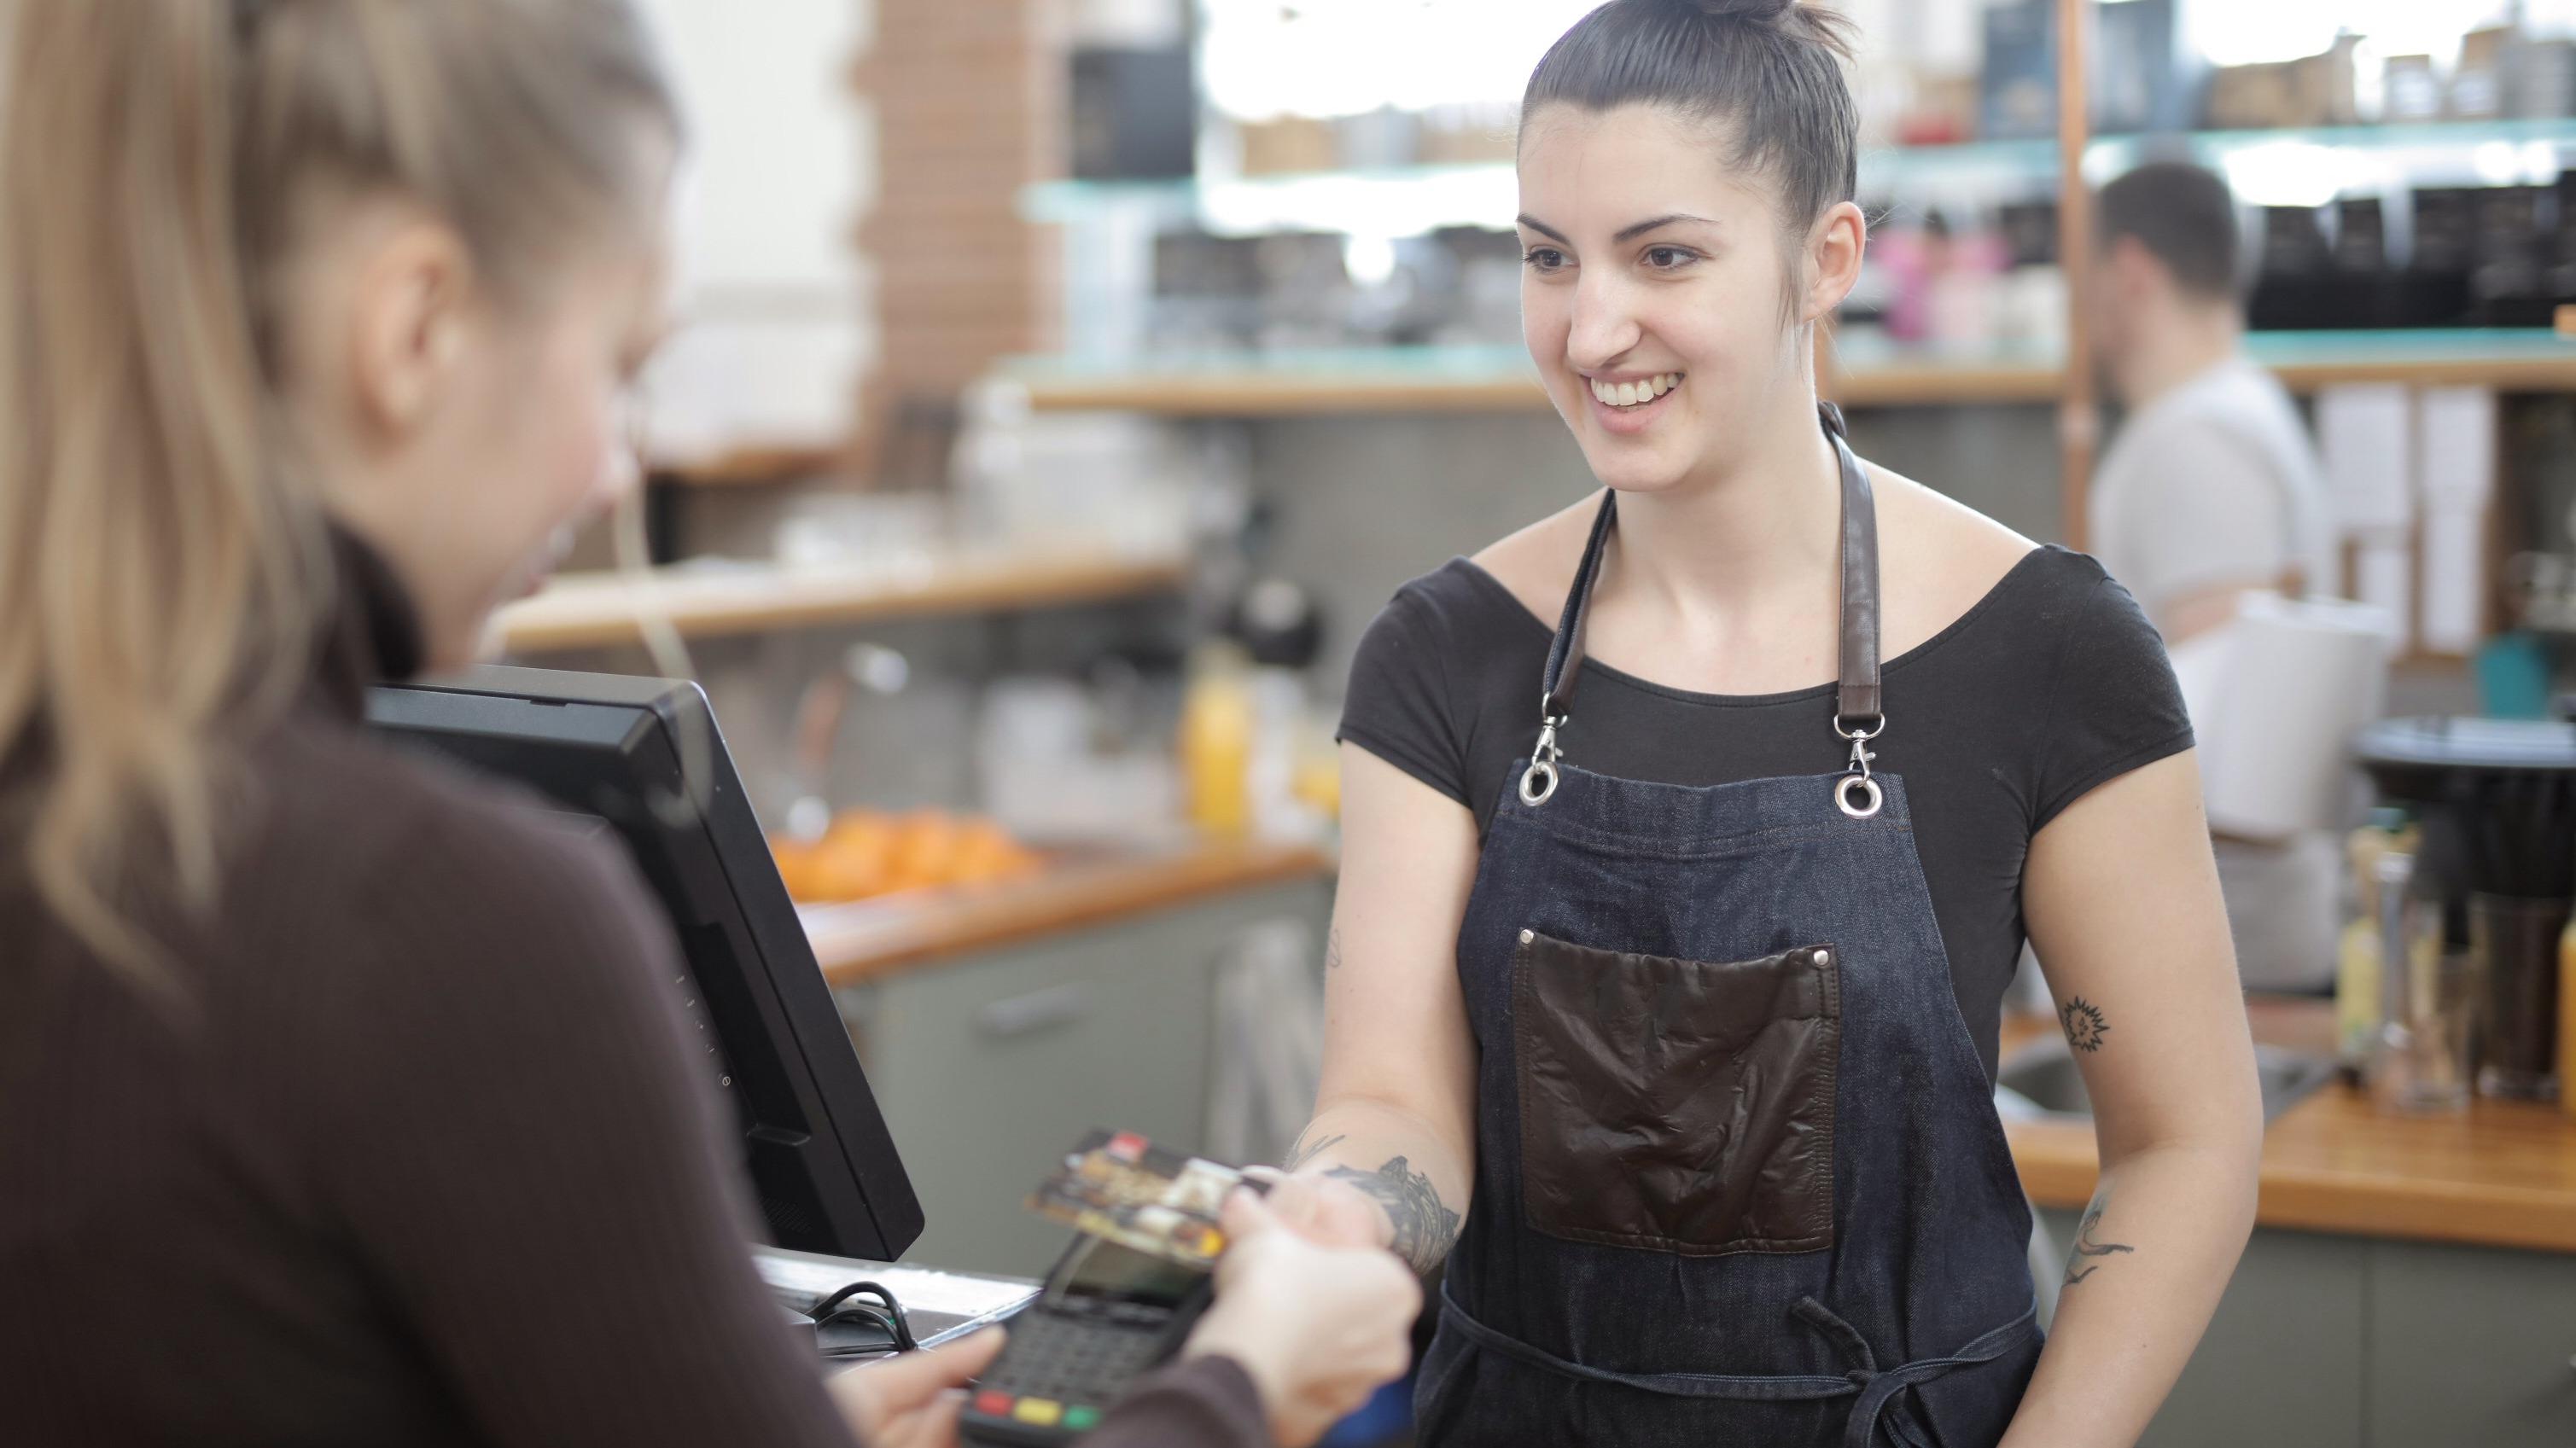 Business, Cafe, Owner